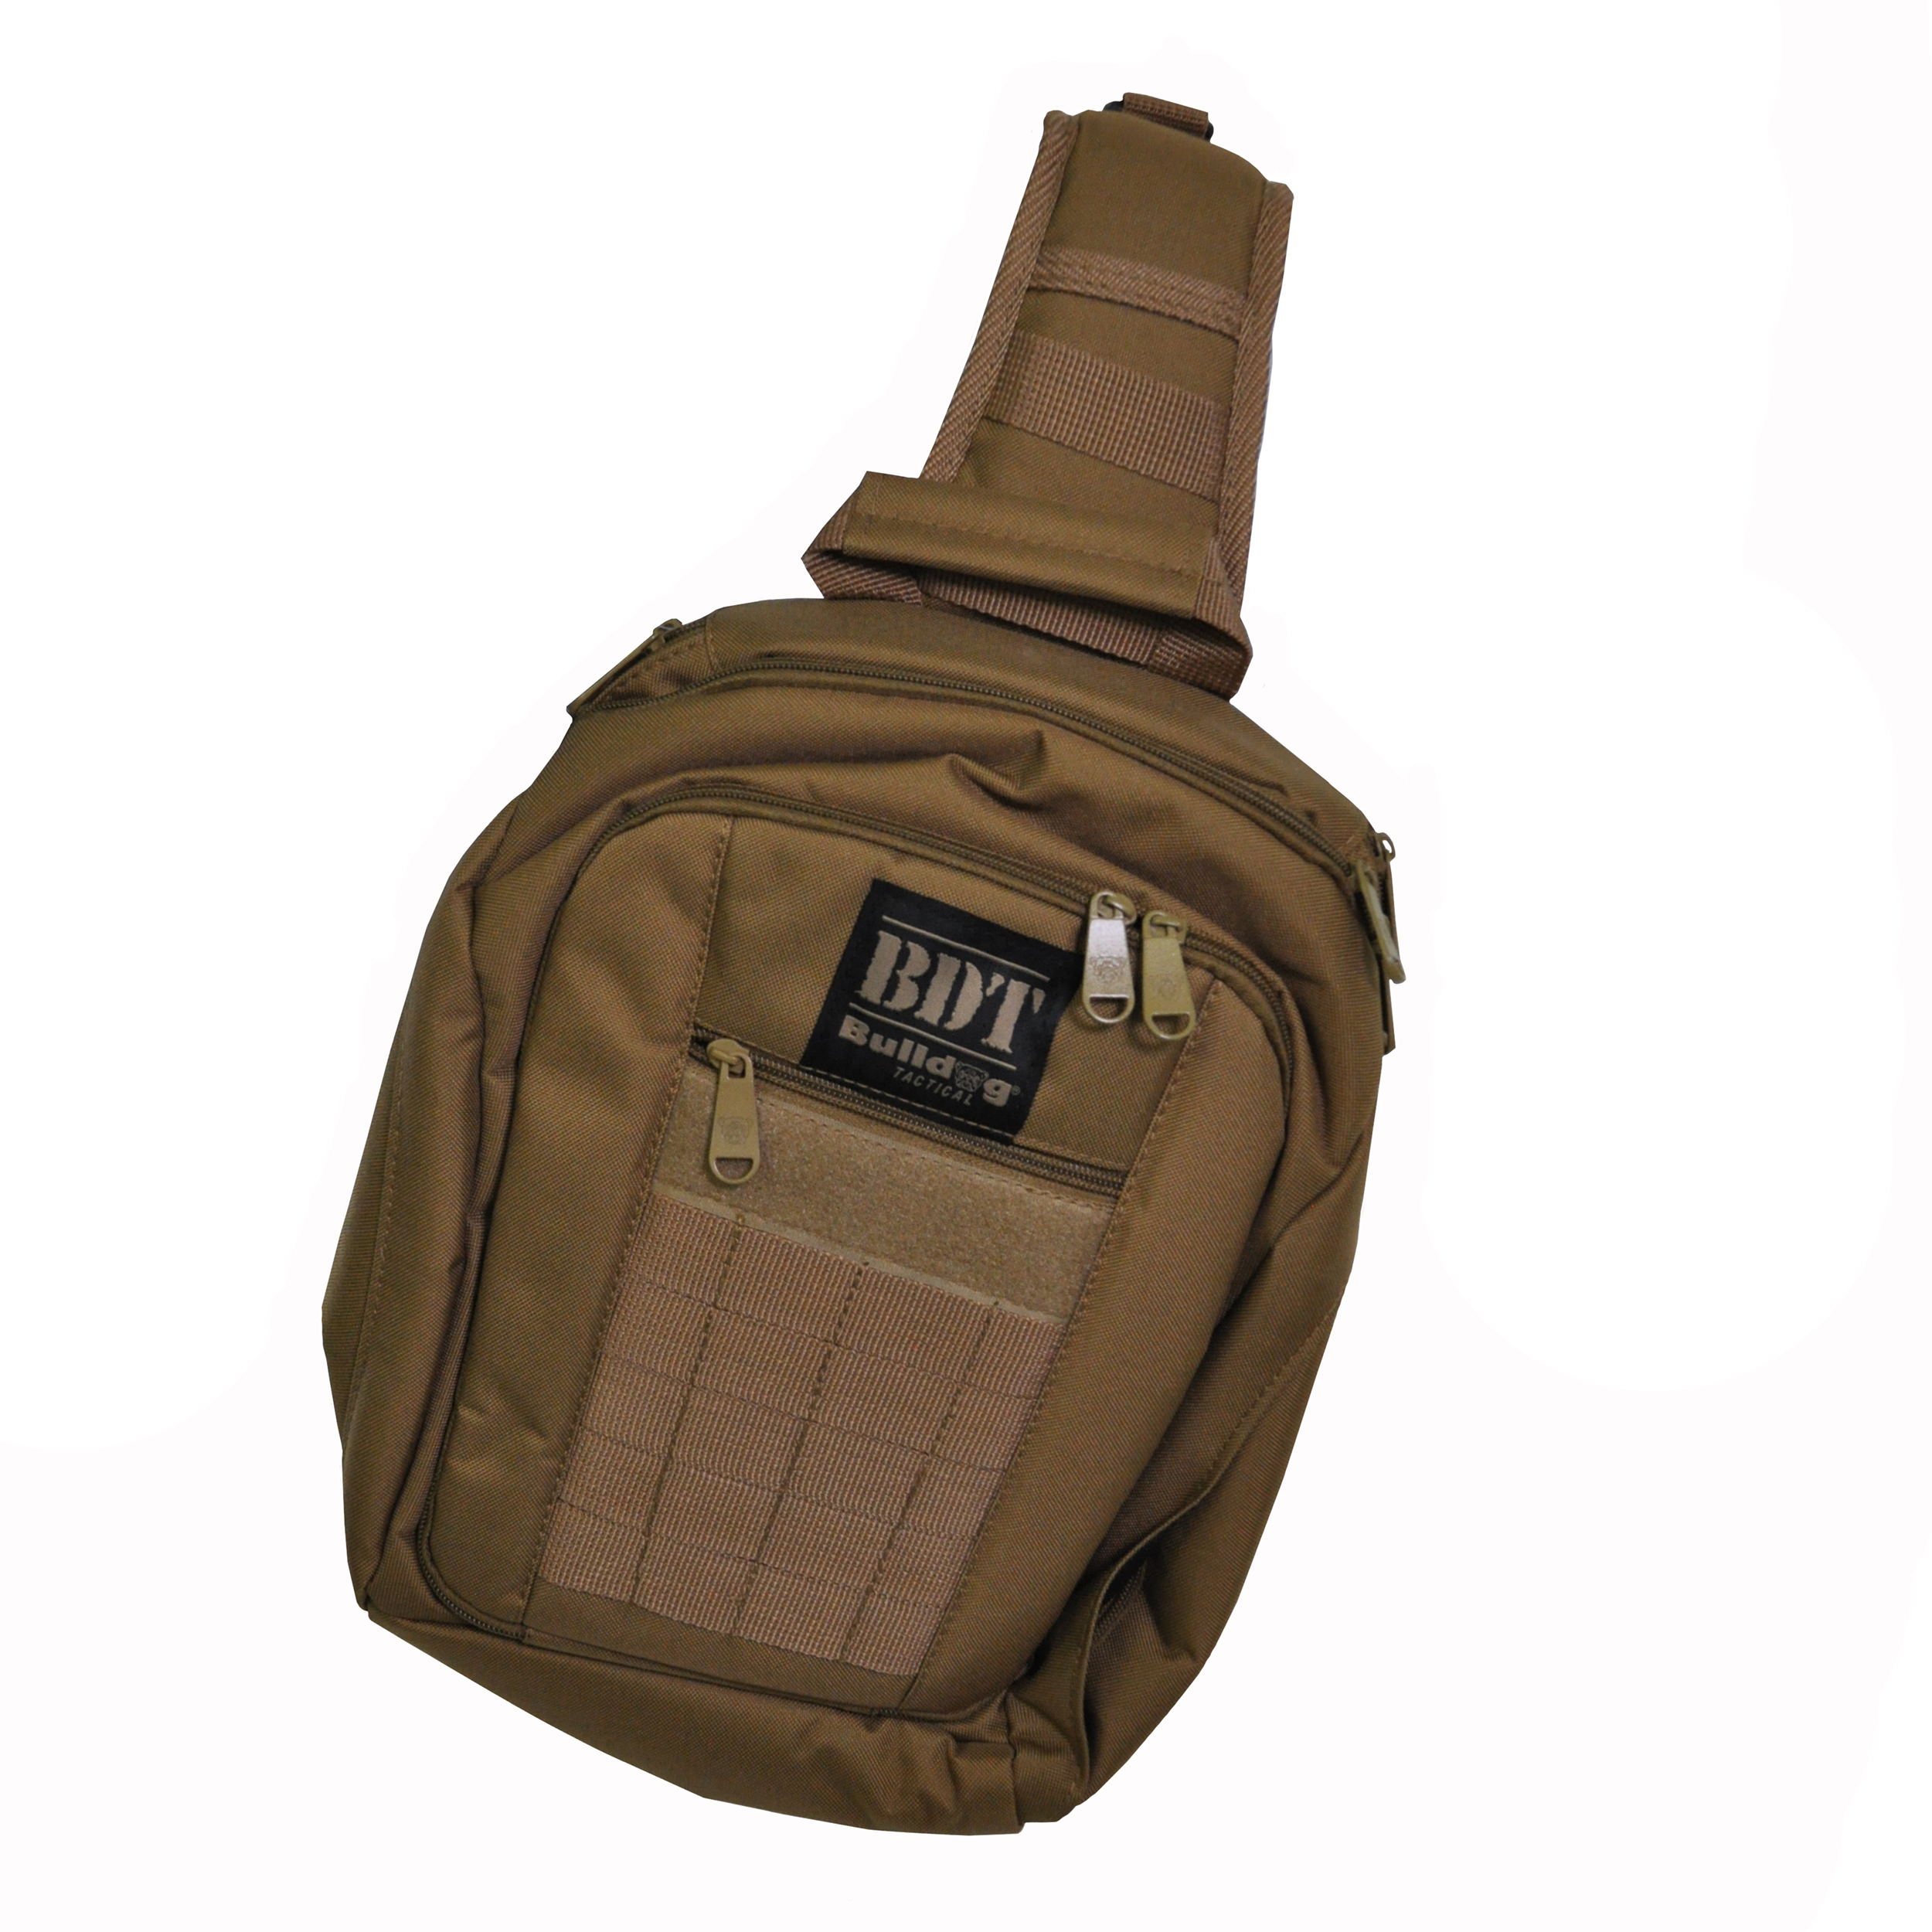 Bulldog Cases BDT Small Sling Pack- Tan